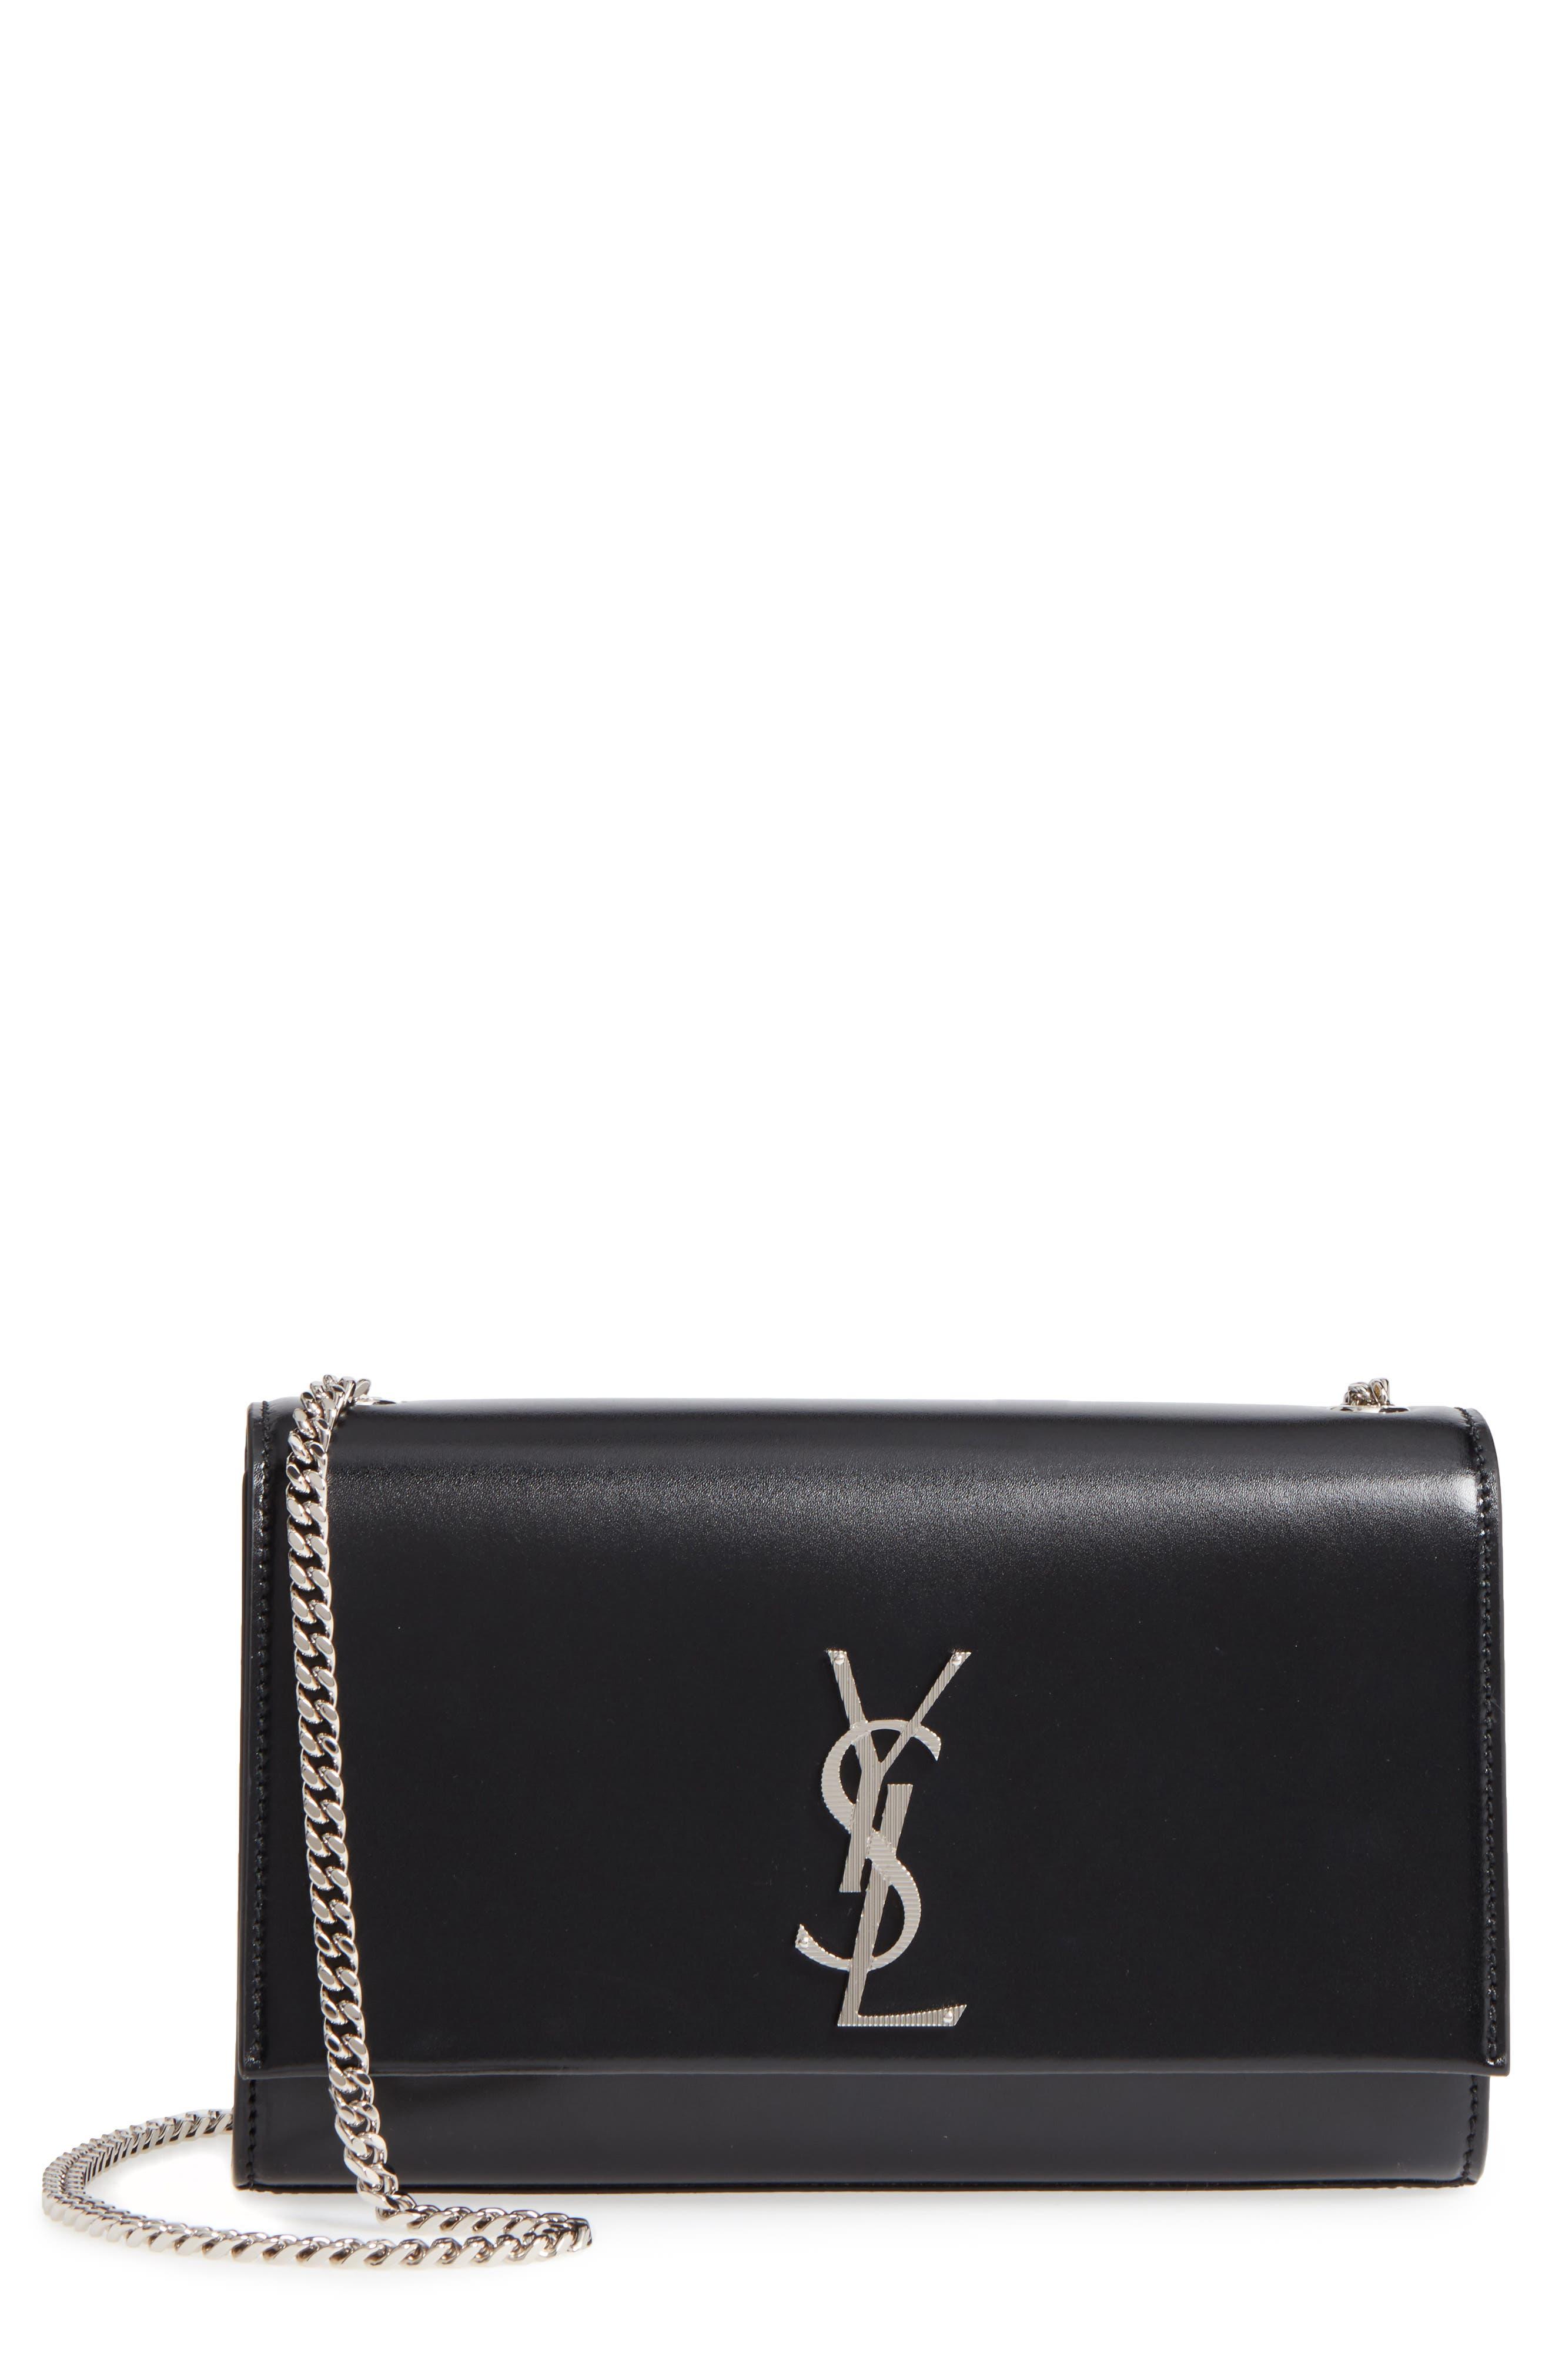 Medium Kate Calfskin Leather Crossbody Bag,                             Main thumbnail 1, color,                             001